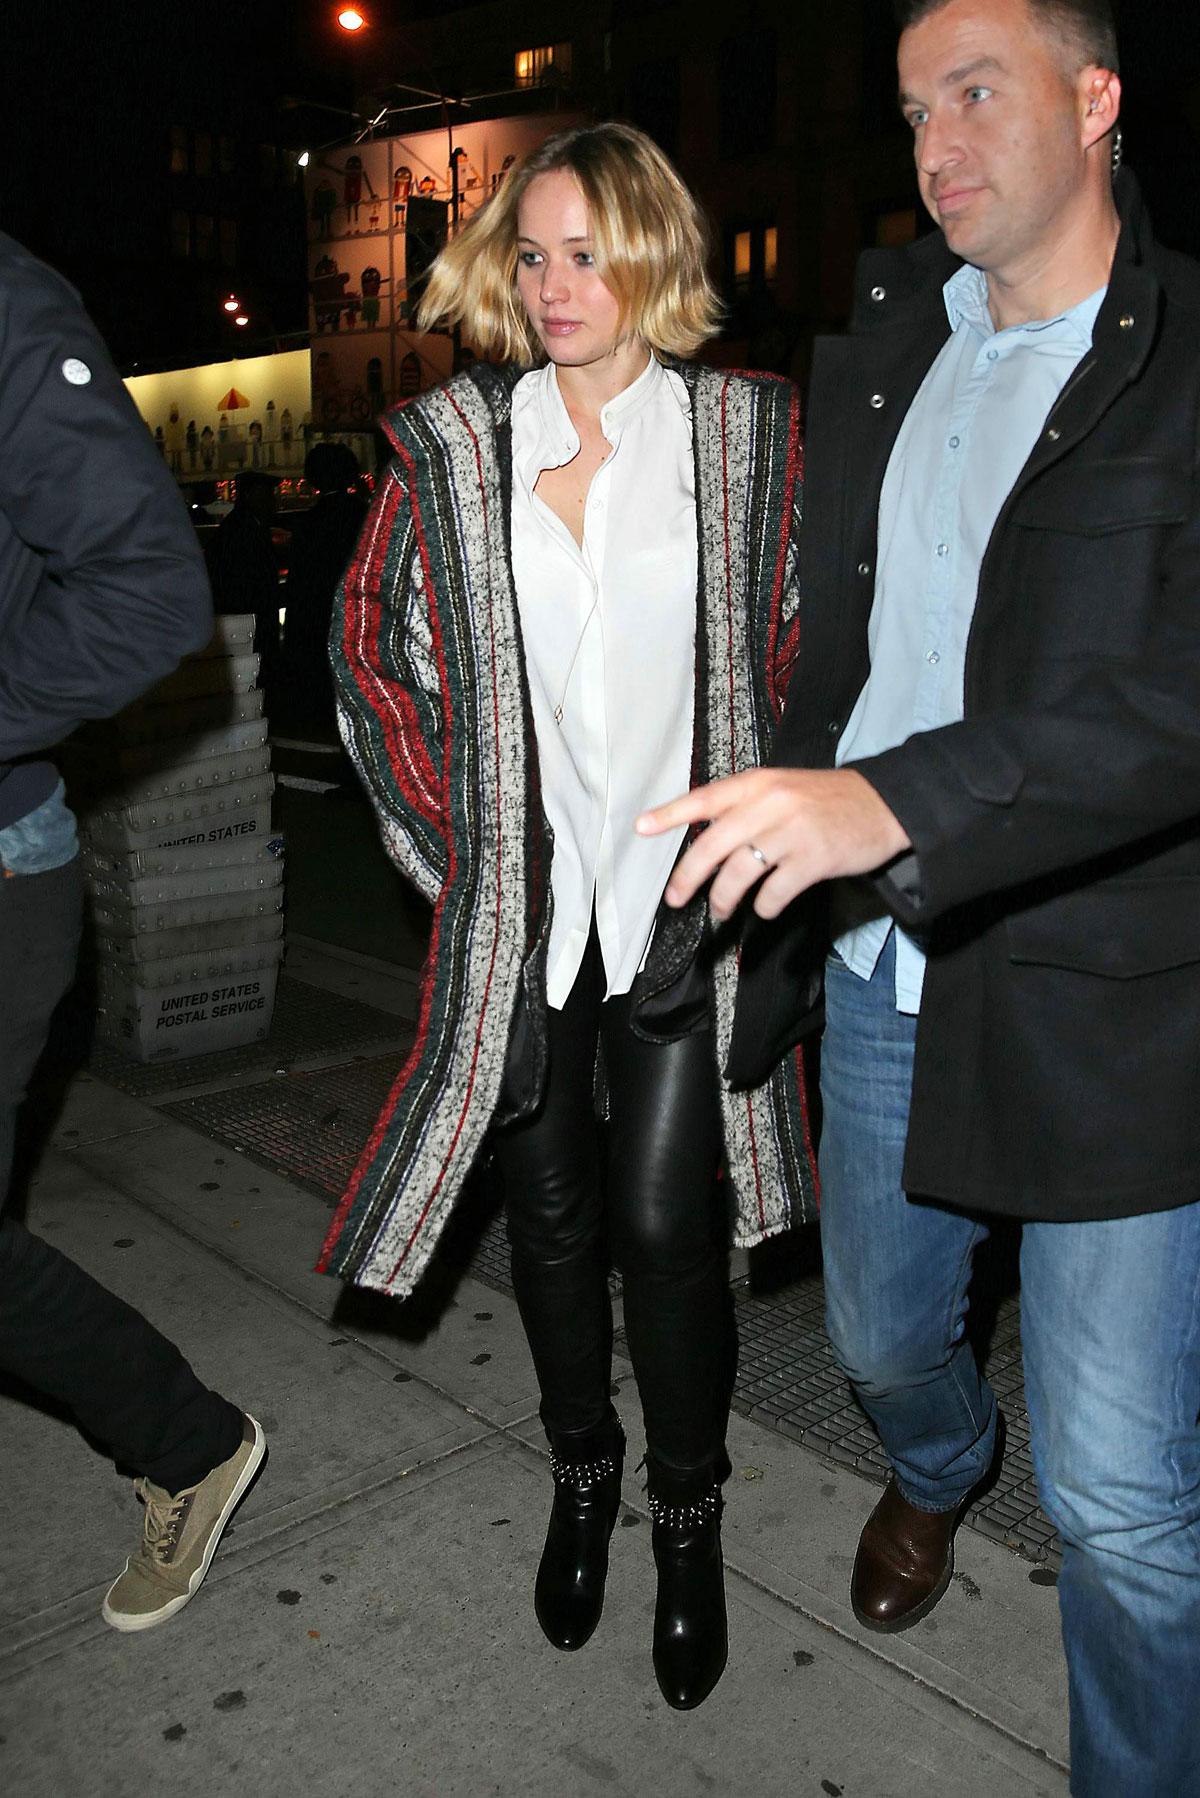 Jennifer Lawrence is seen spotted leaving Restaurant